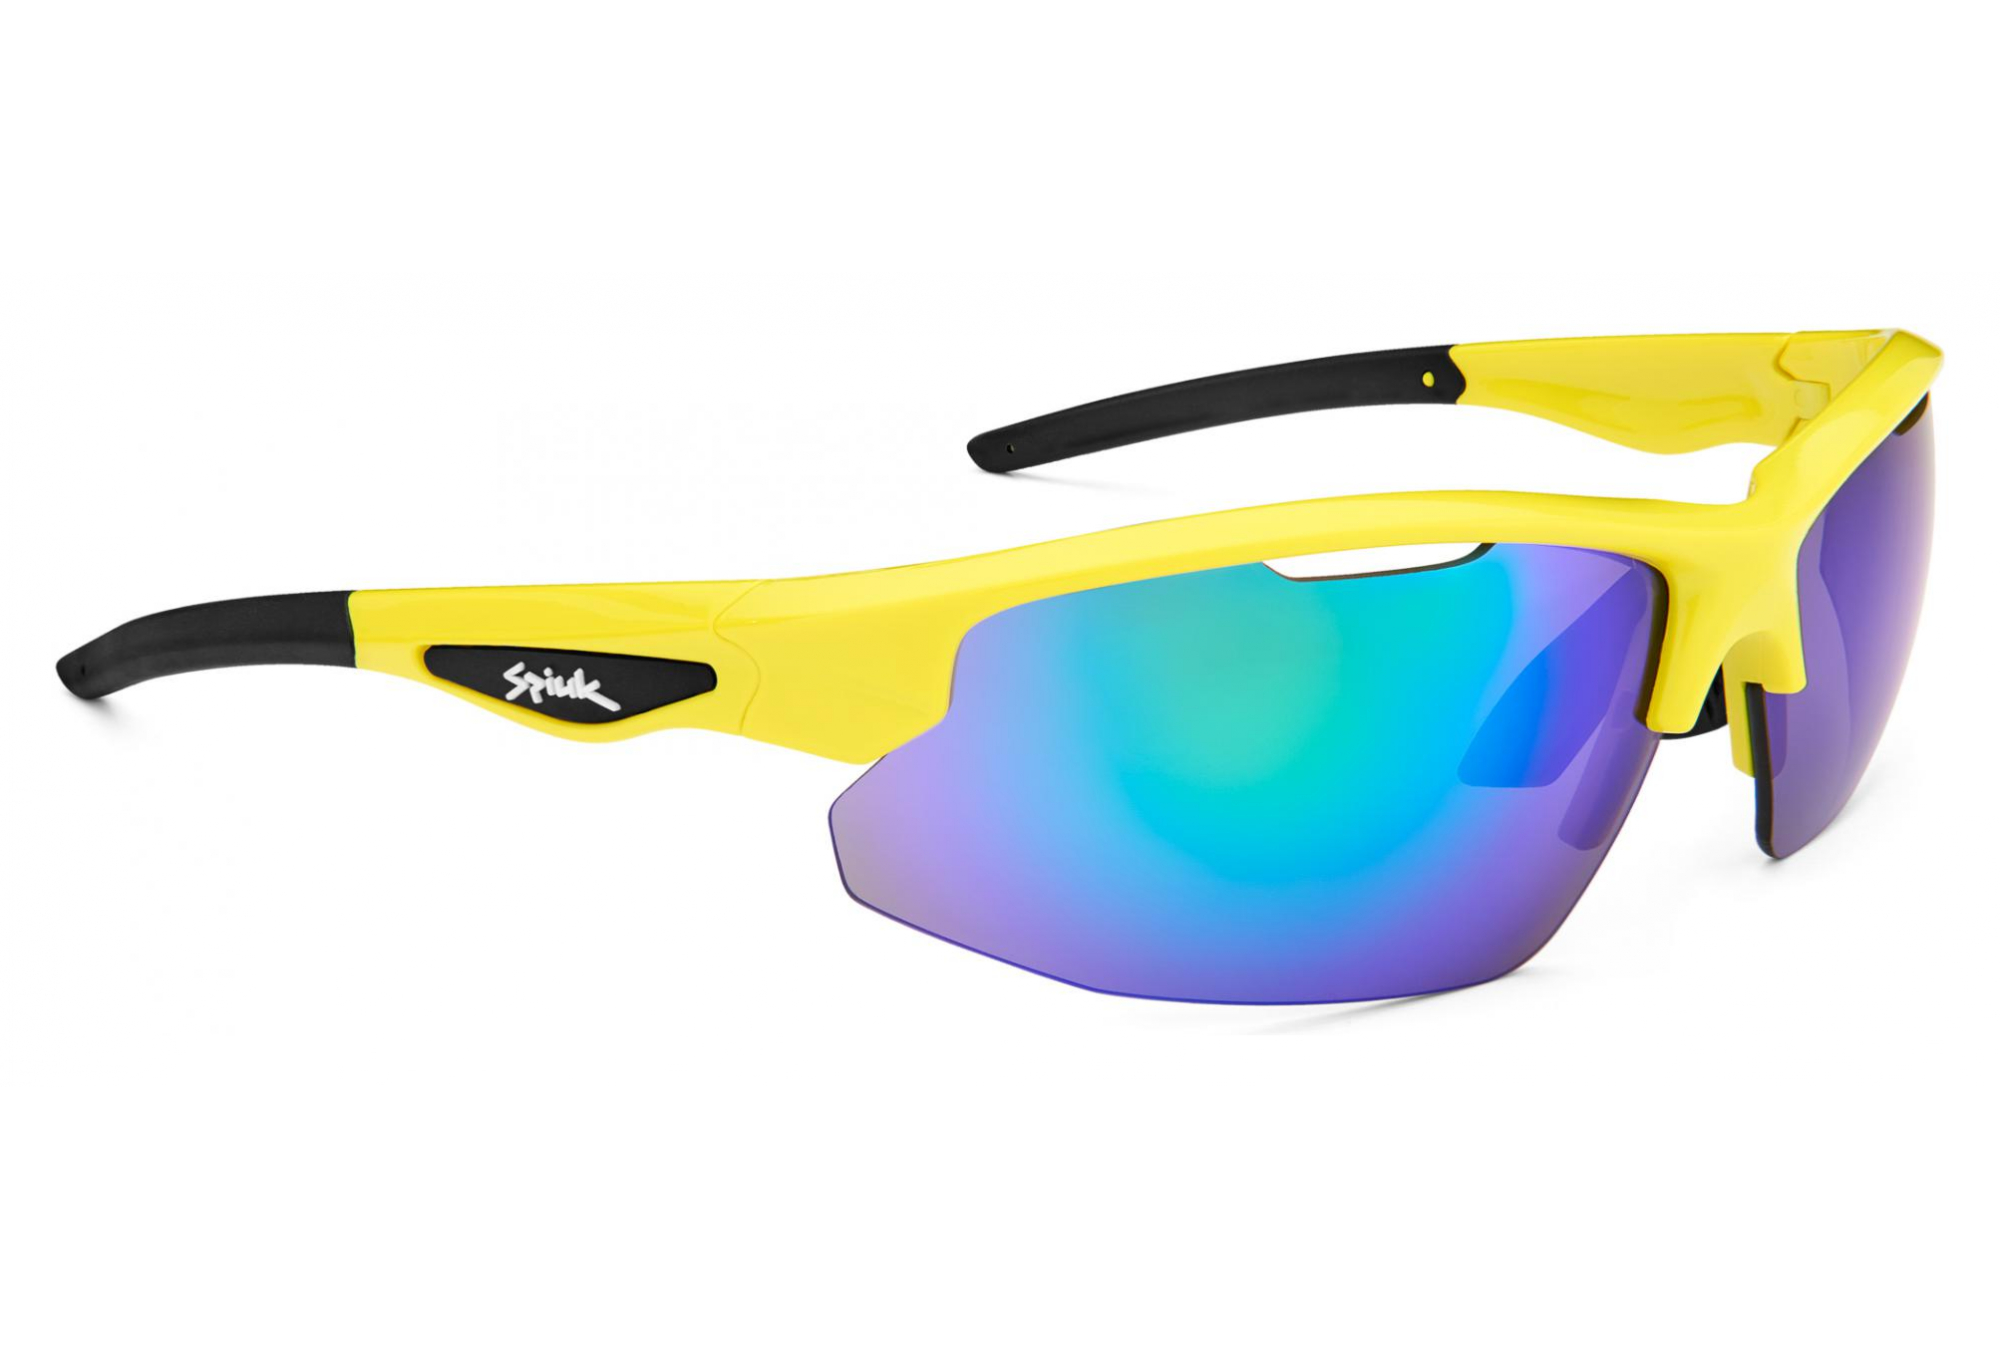 Kolesarska očala spiuk rimma rumene